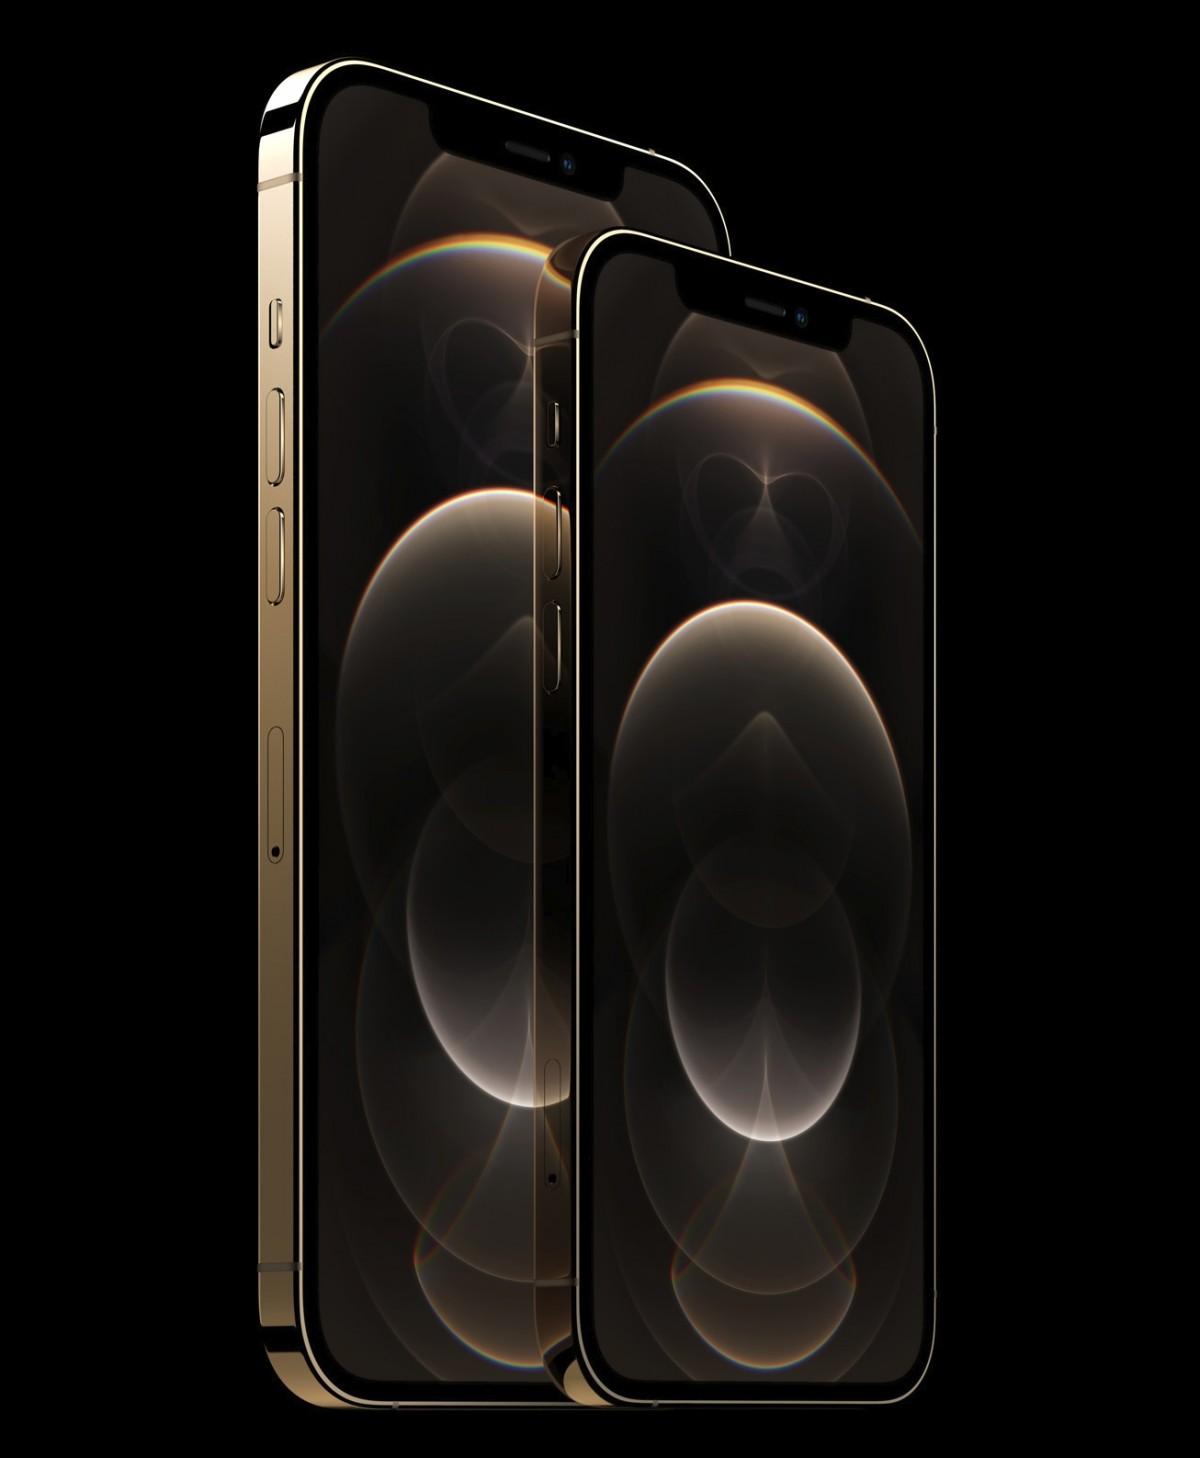 Hot Take: iPhone 12 lineup